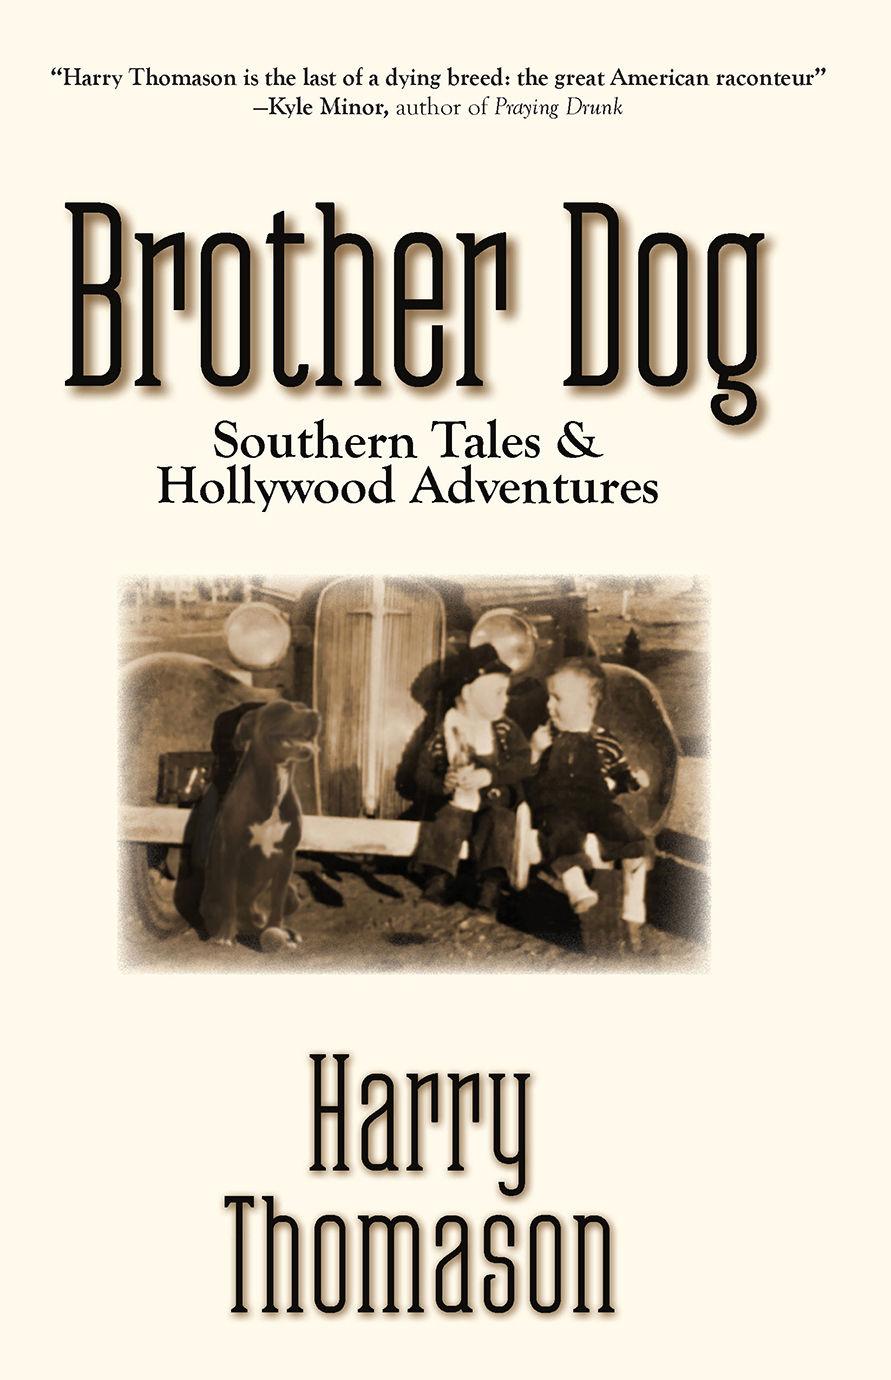 101719 Brother Dog.jpg